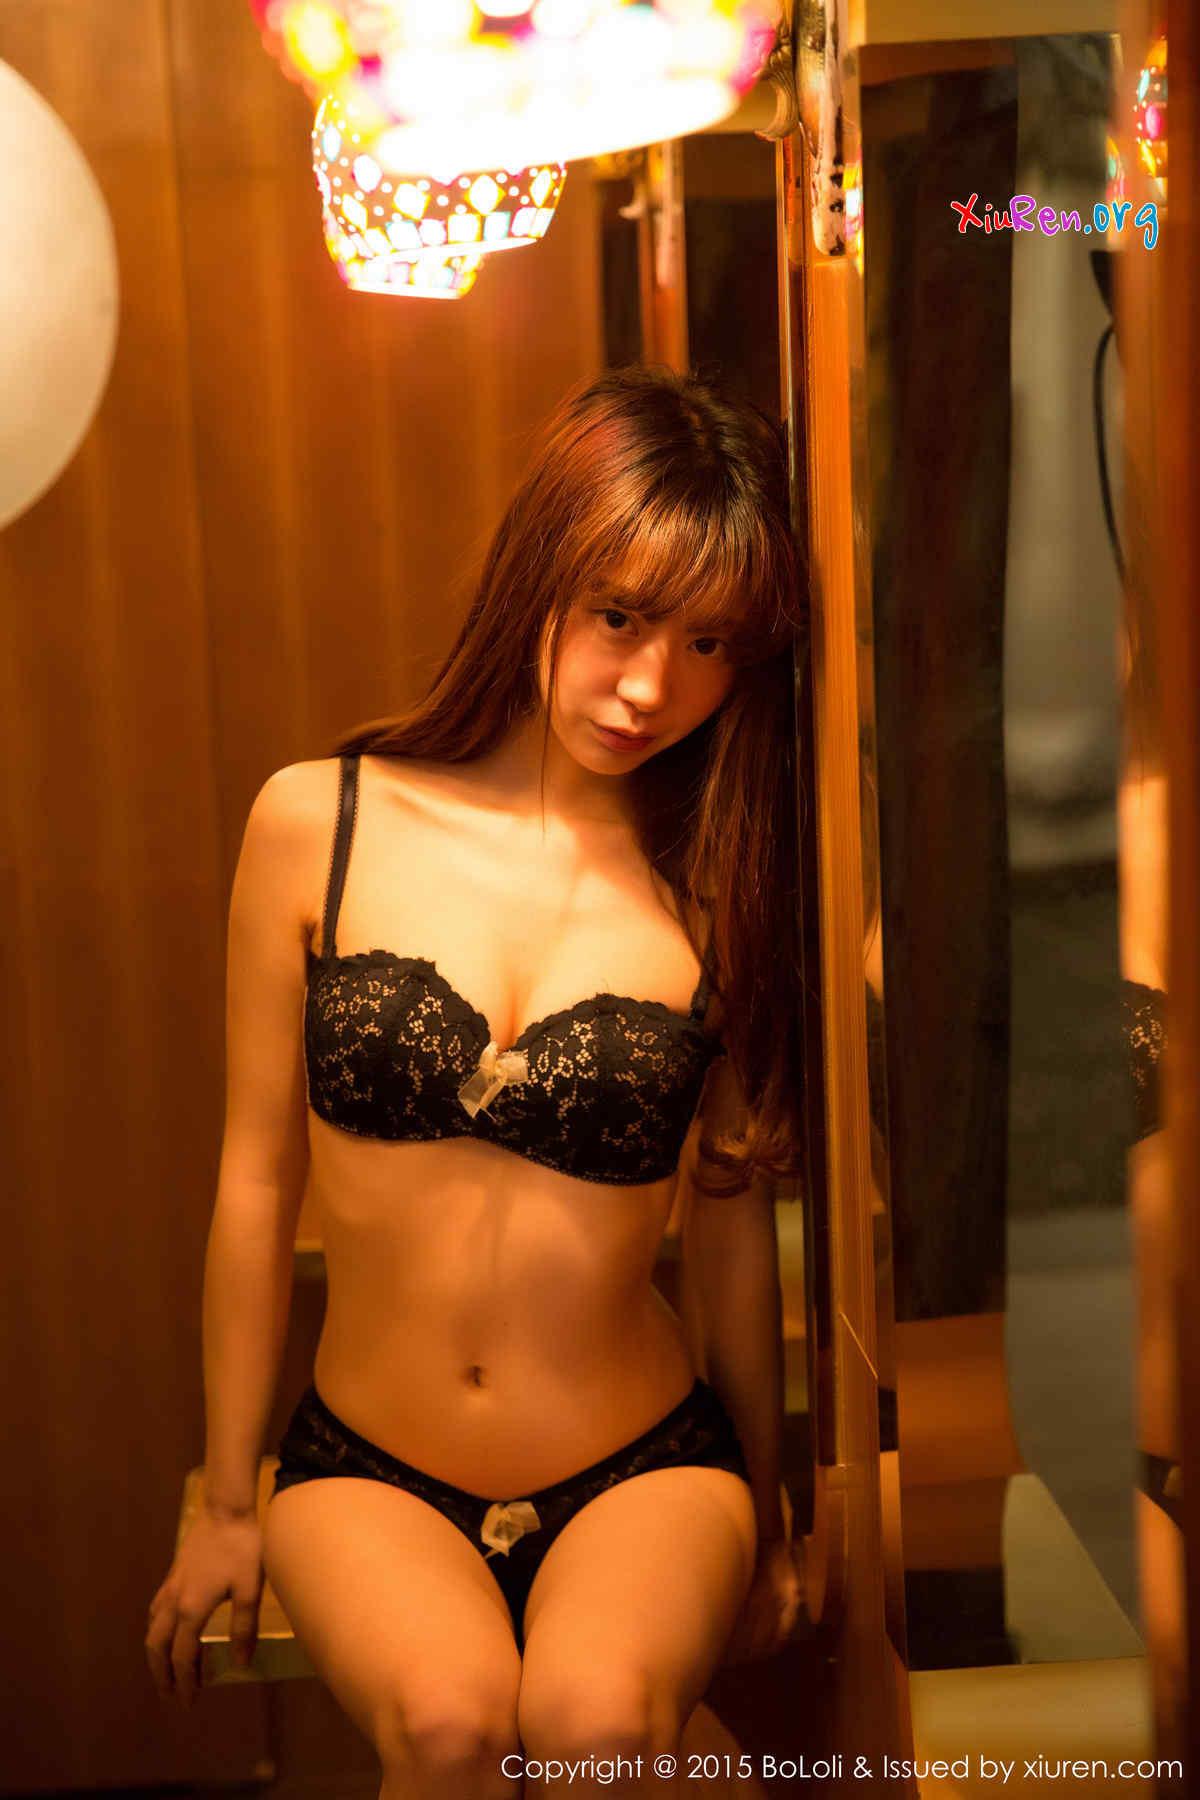 PhimVu-Blog-0045.jpg